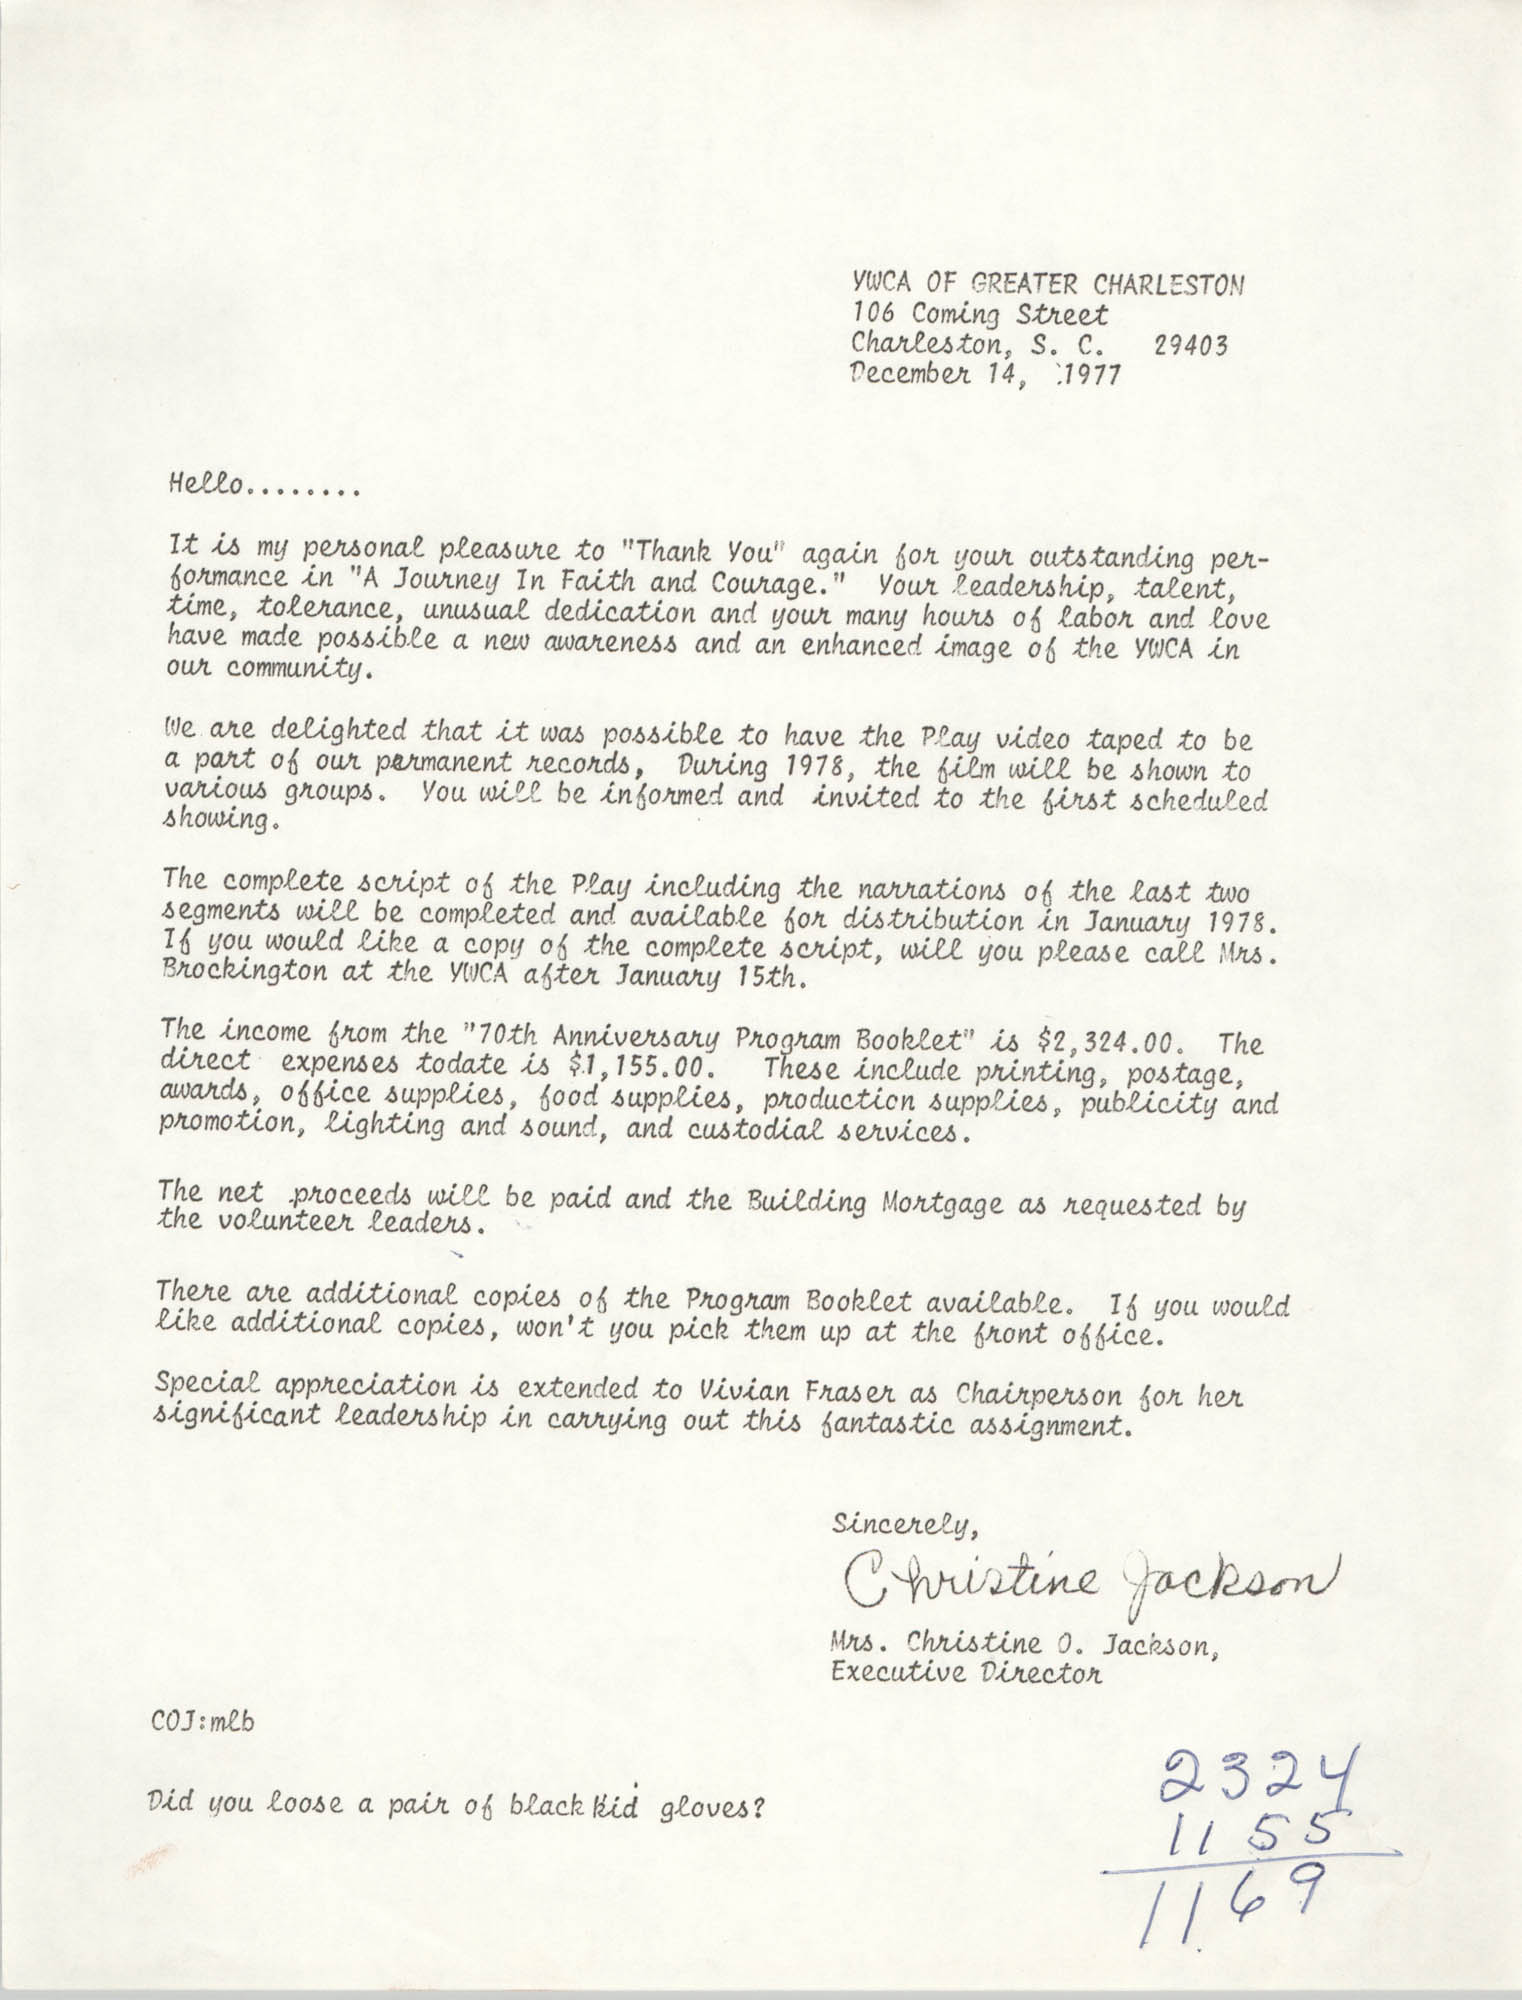 Letter from Christine O. Jackson, December 14, 1977